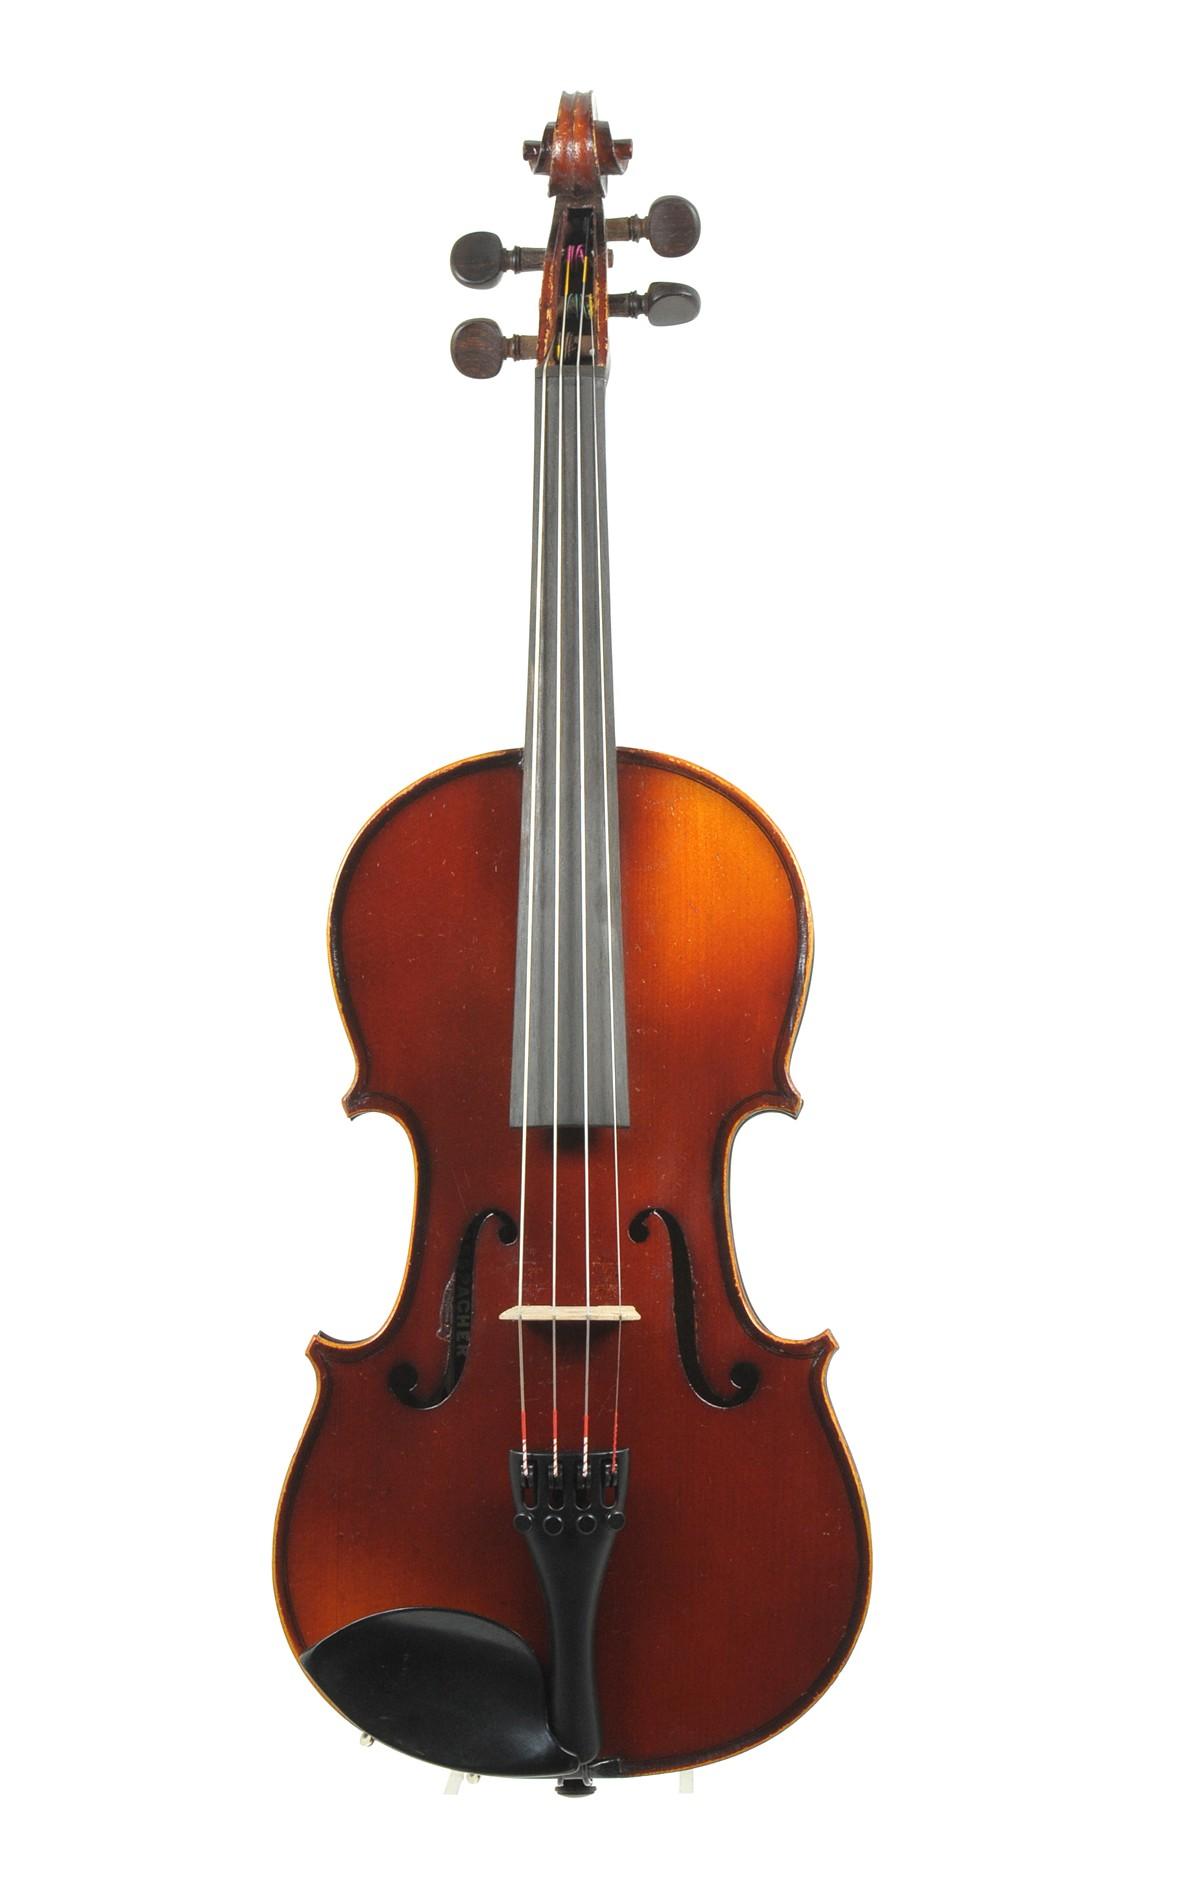 3/4 violin after Guarneri, Mirecourt - top view